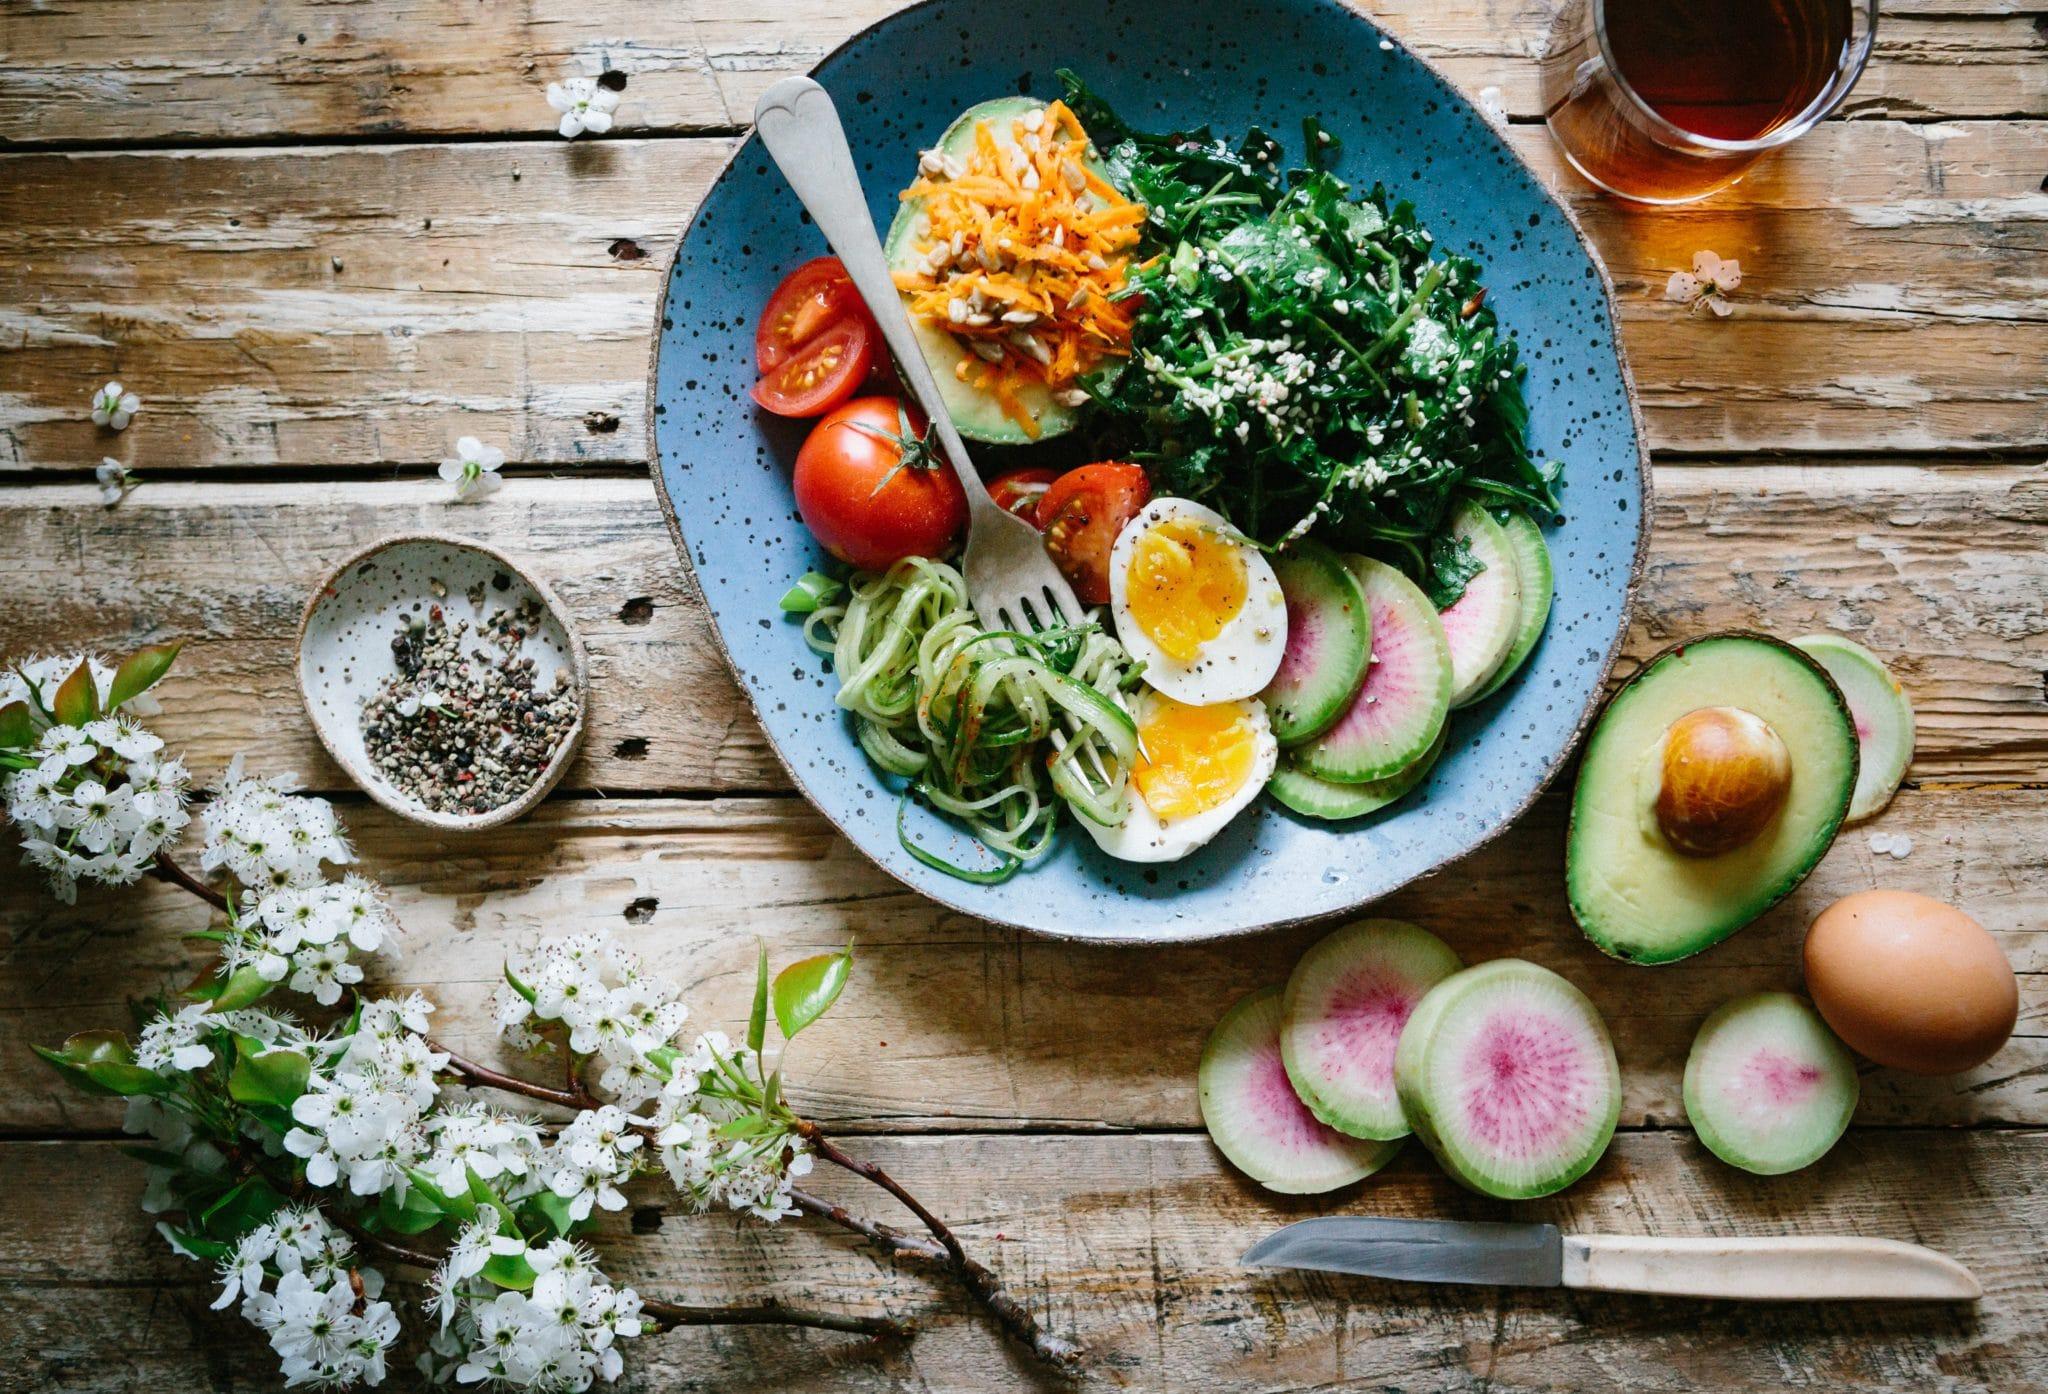 birds eye of a keto bowl with eggs, avocado, and veggies